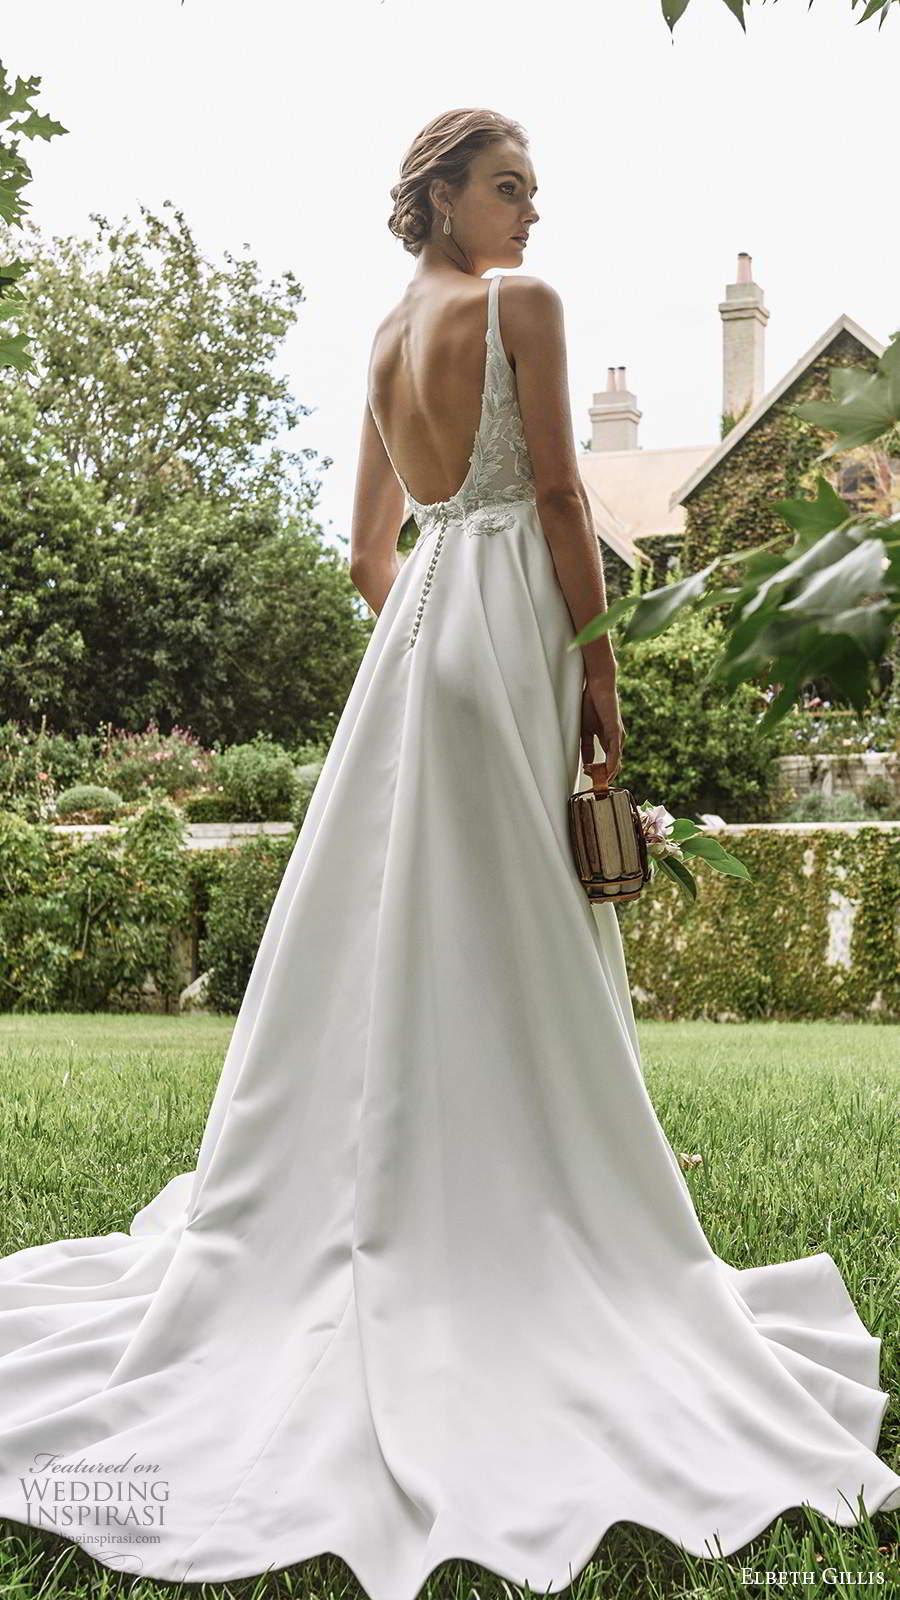 elbeth gillis 2021 bridal sleeveless straps scoop neckline embellished bodice a ilne ball gown wedding dress scoop back chapel train (11) bv